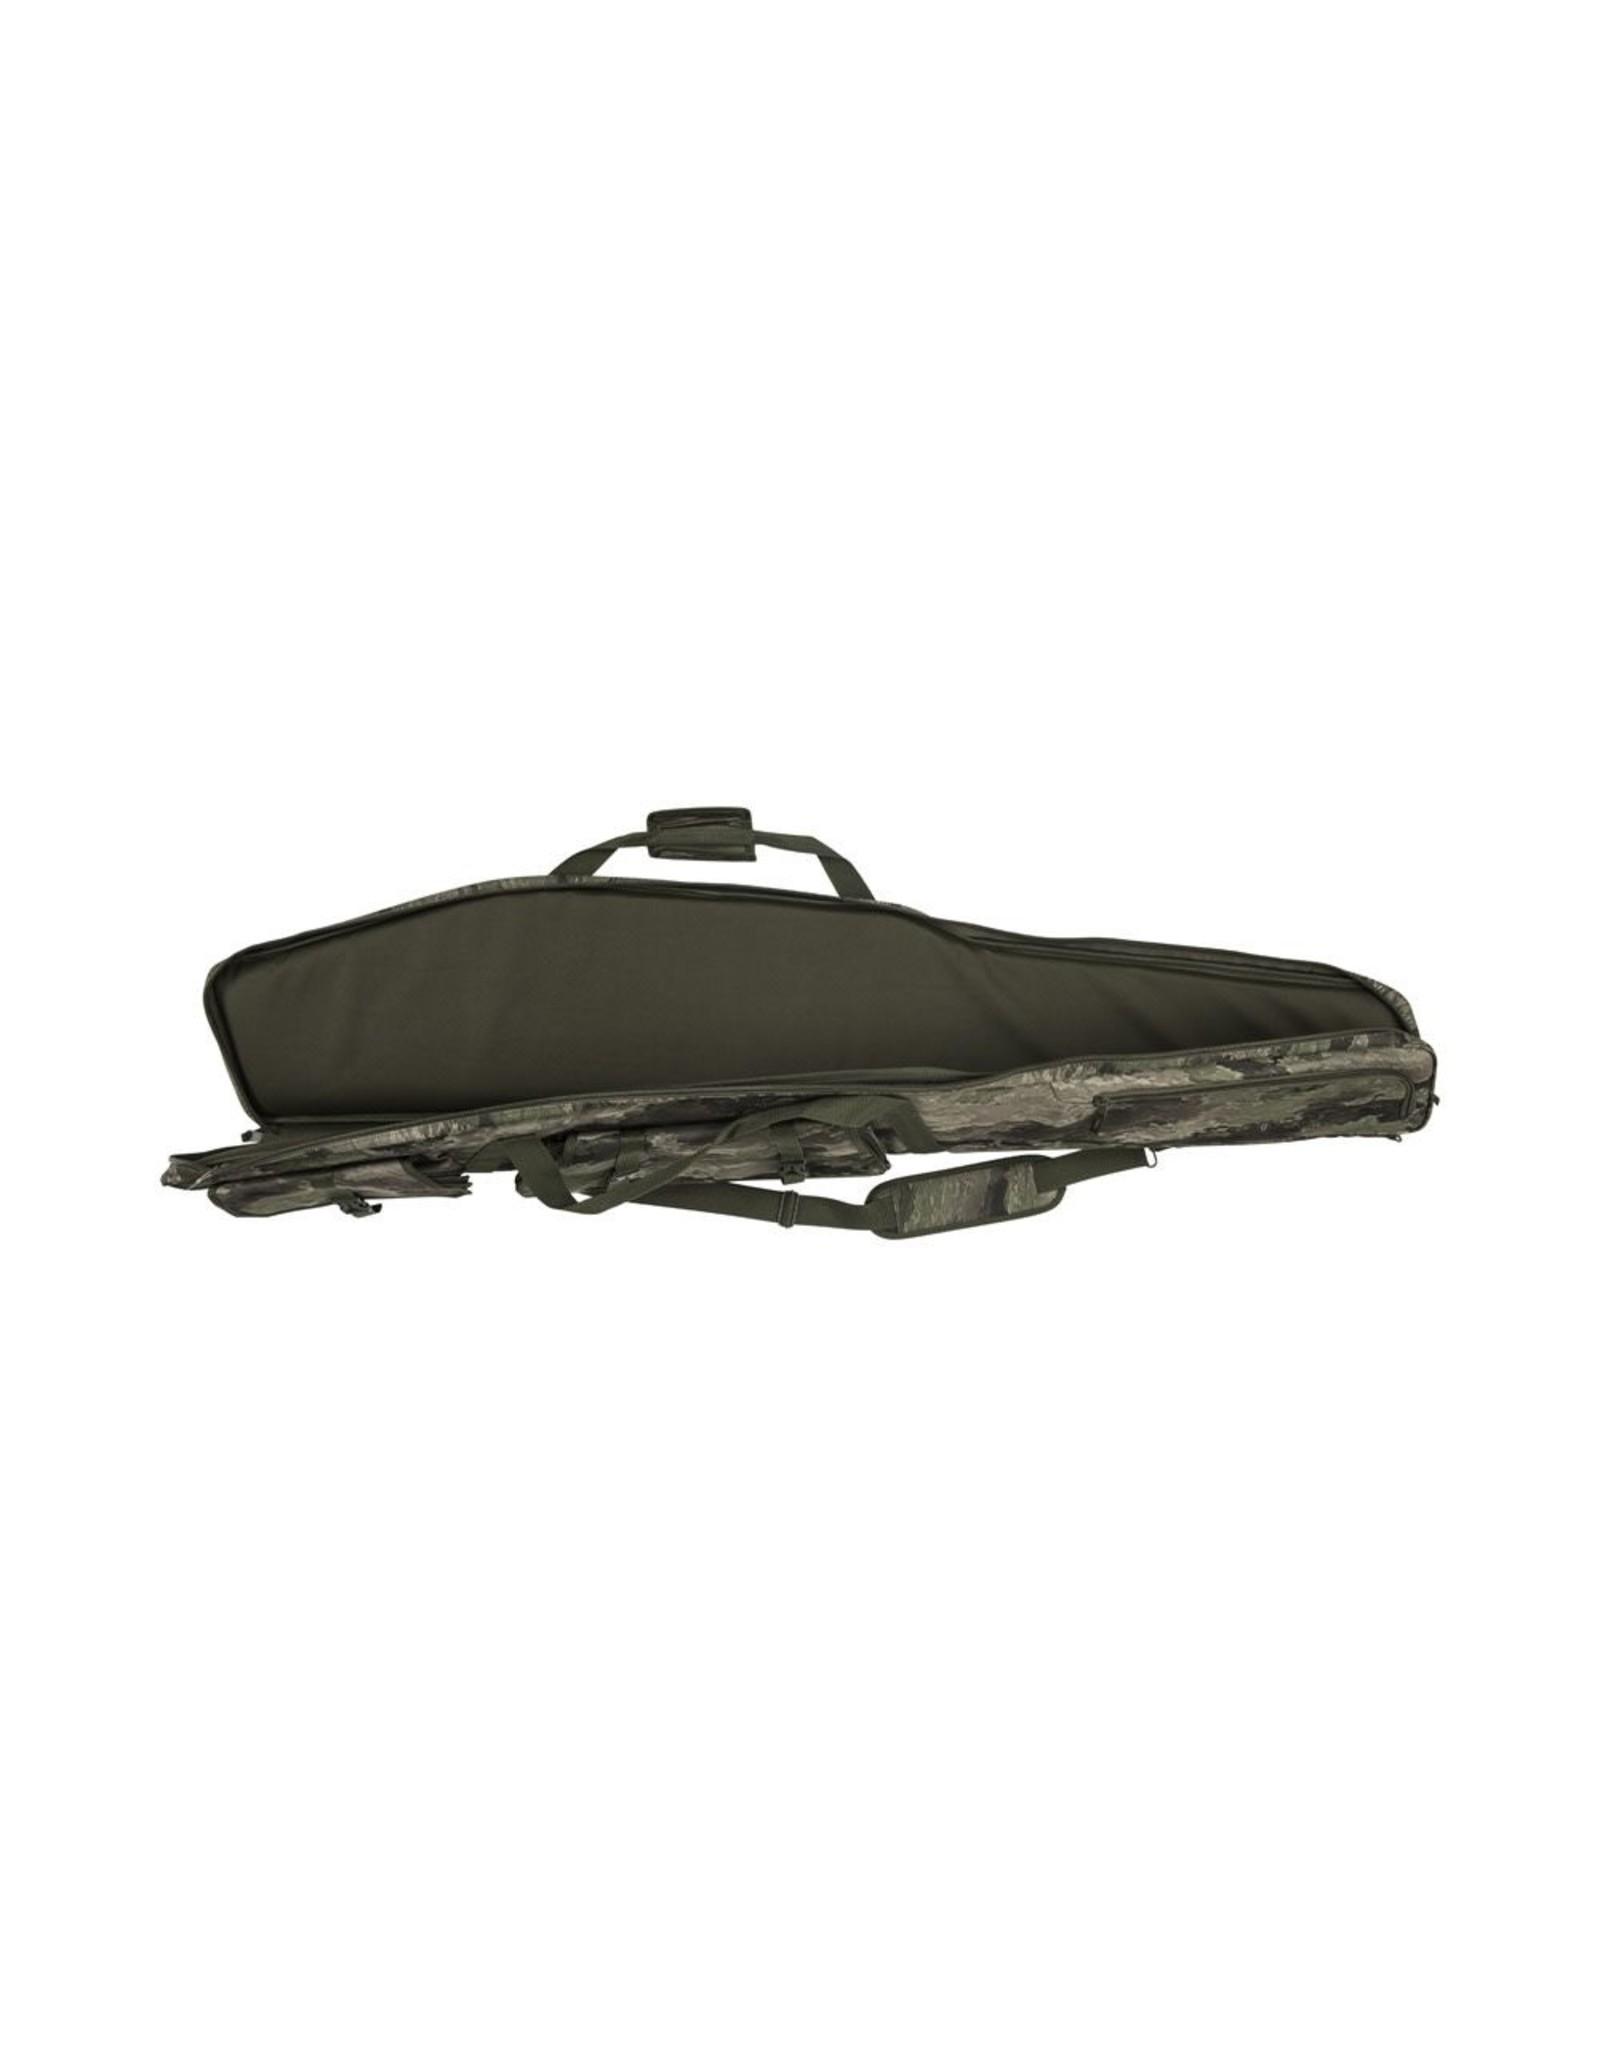 ALLEN COMPANY Tac6 Velocity Tactical Case